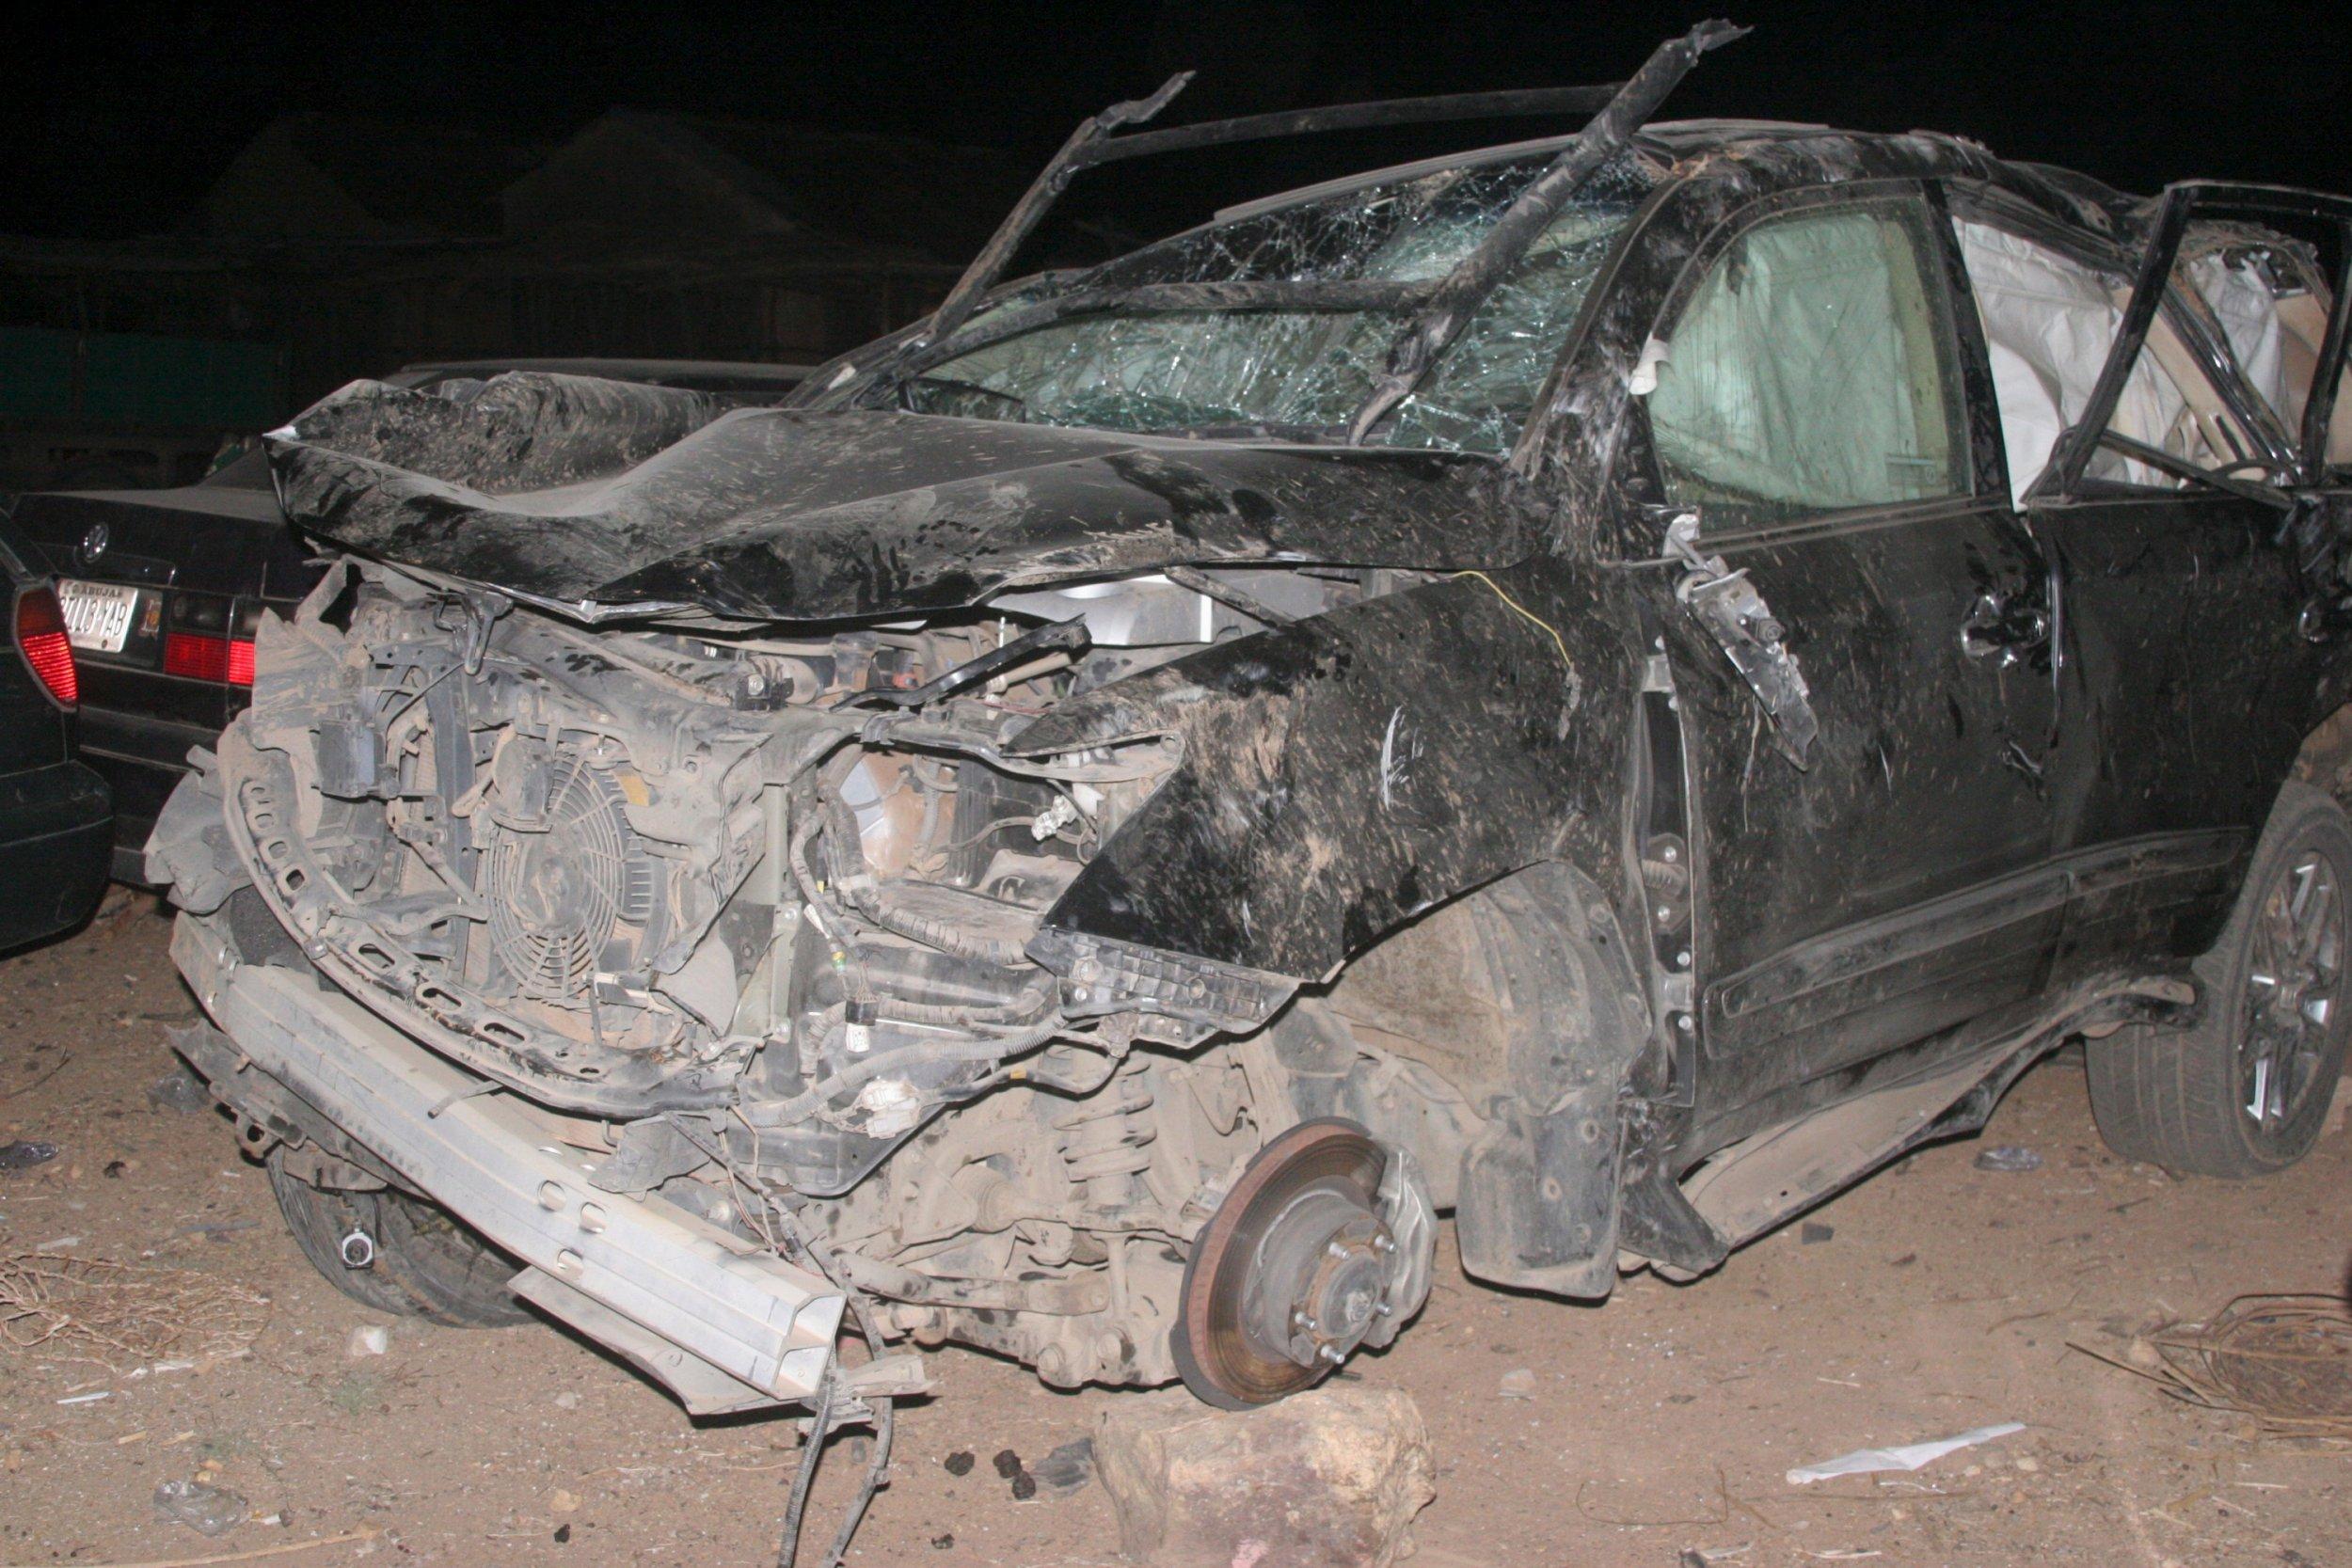 The jeep that transported James Ocholi is seen in Kaduna.